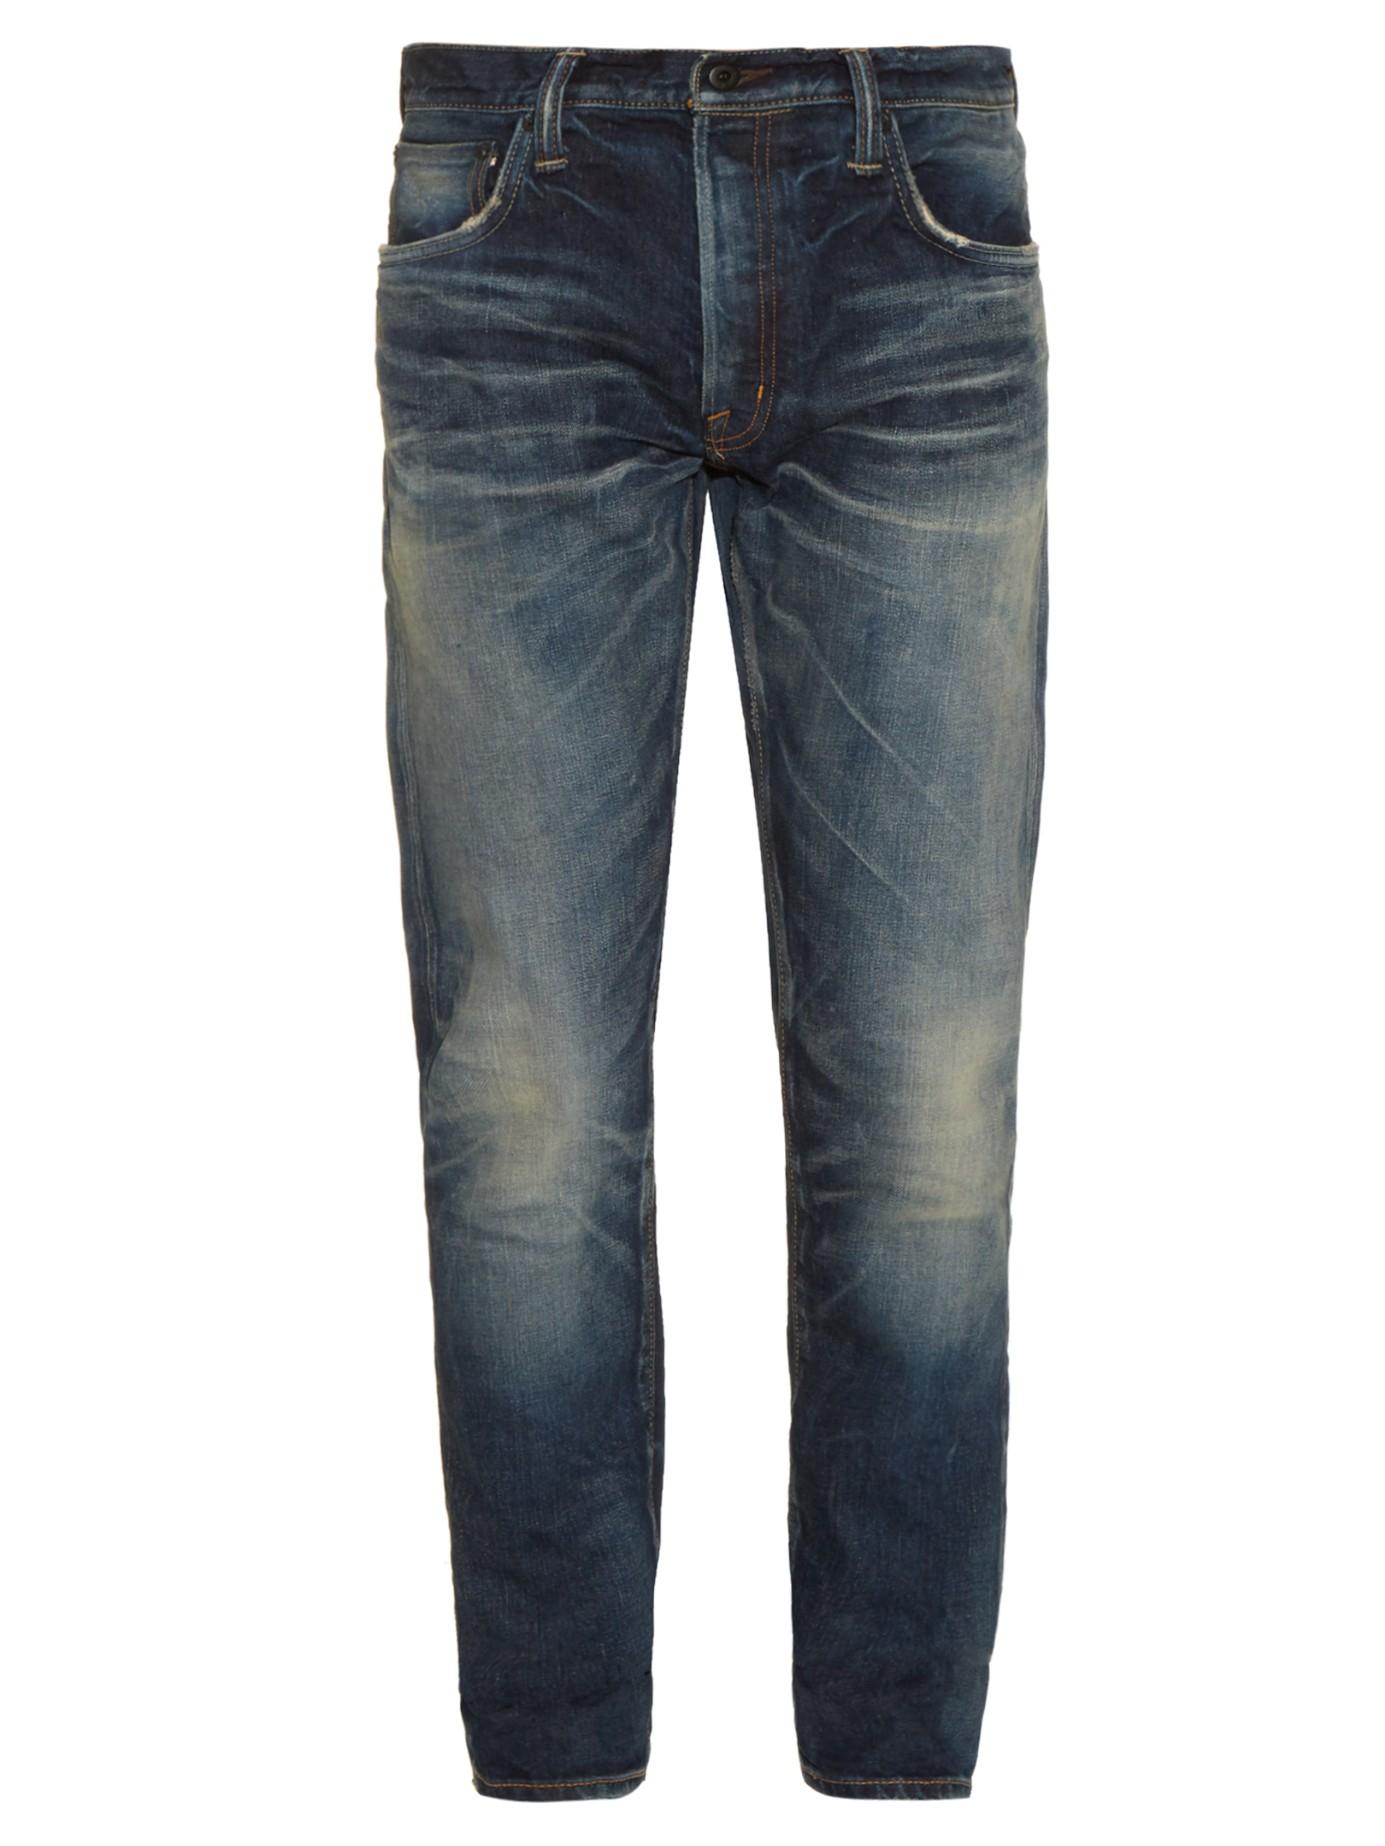 Mastercraft union Slim Taper Vintage-wash Jeans in Blue ...